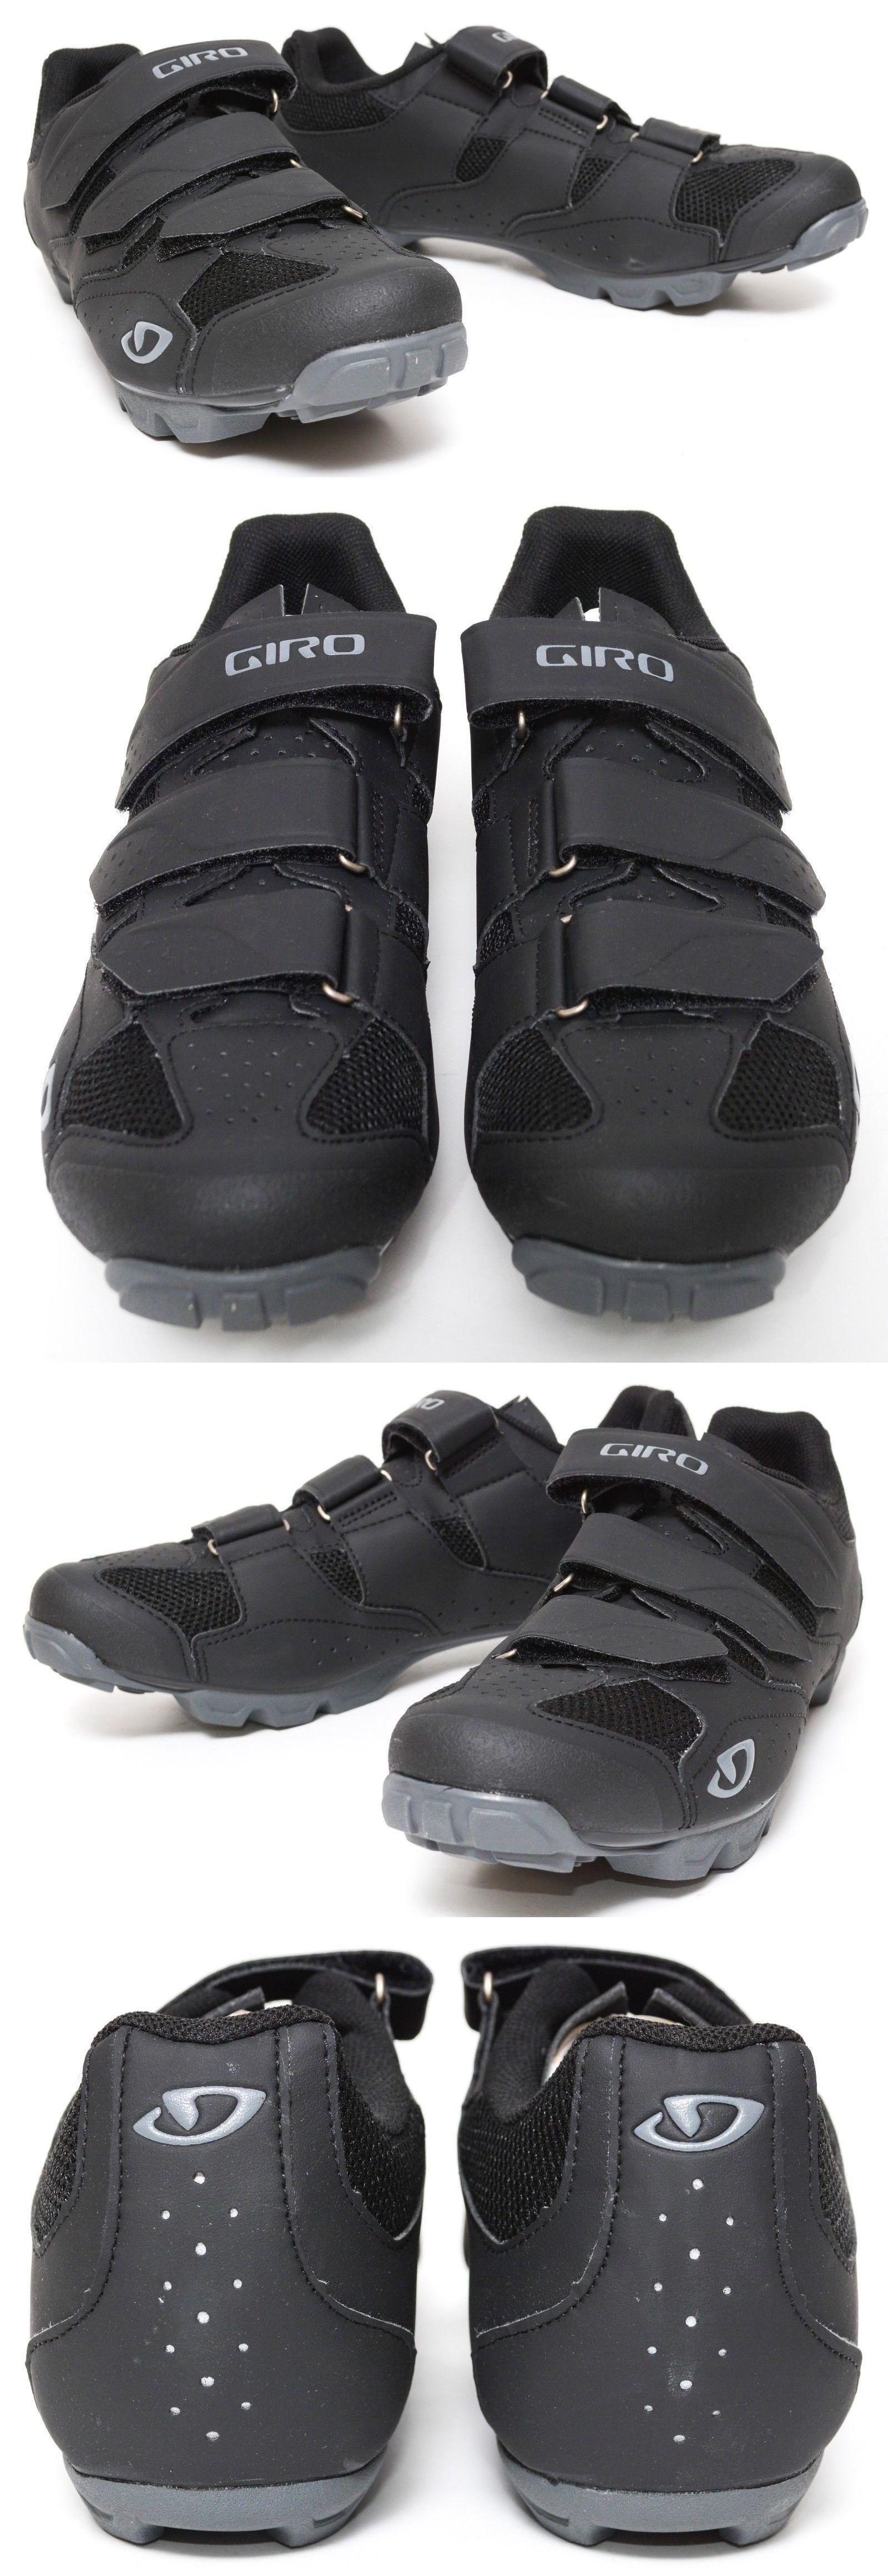 b12836cb778 Cycling Shoes and Shoe Covers 177862  Giro Men Carbide R Ii Trail Mountain Bike  Shoes 2 Bolt Eu 44 Us 10.5 Black Blue -  BUY IT NOW ONLY   69.95 on eBay!